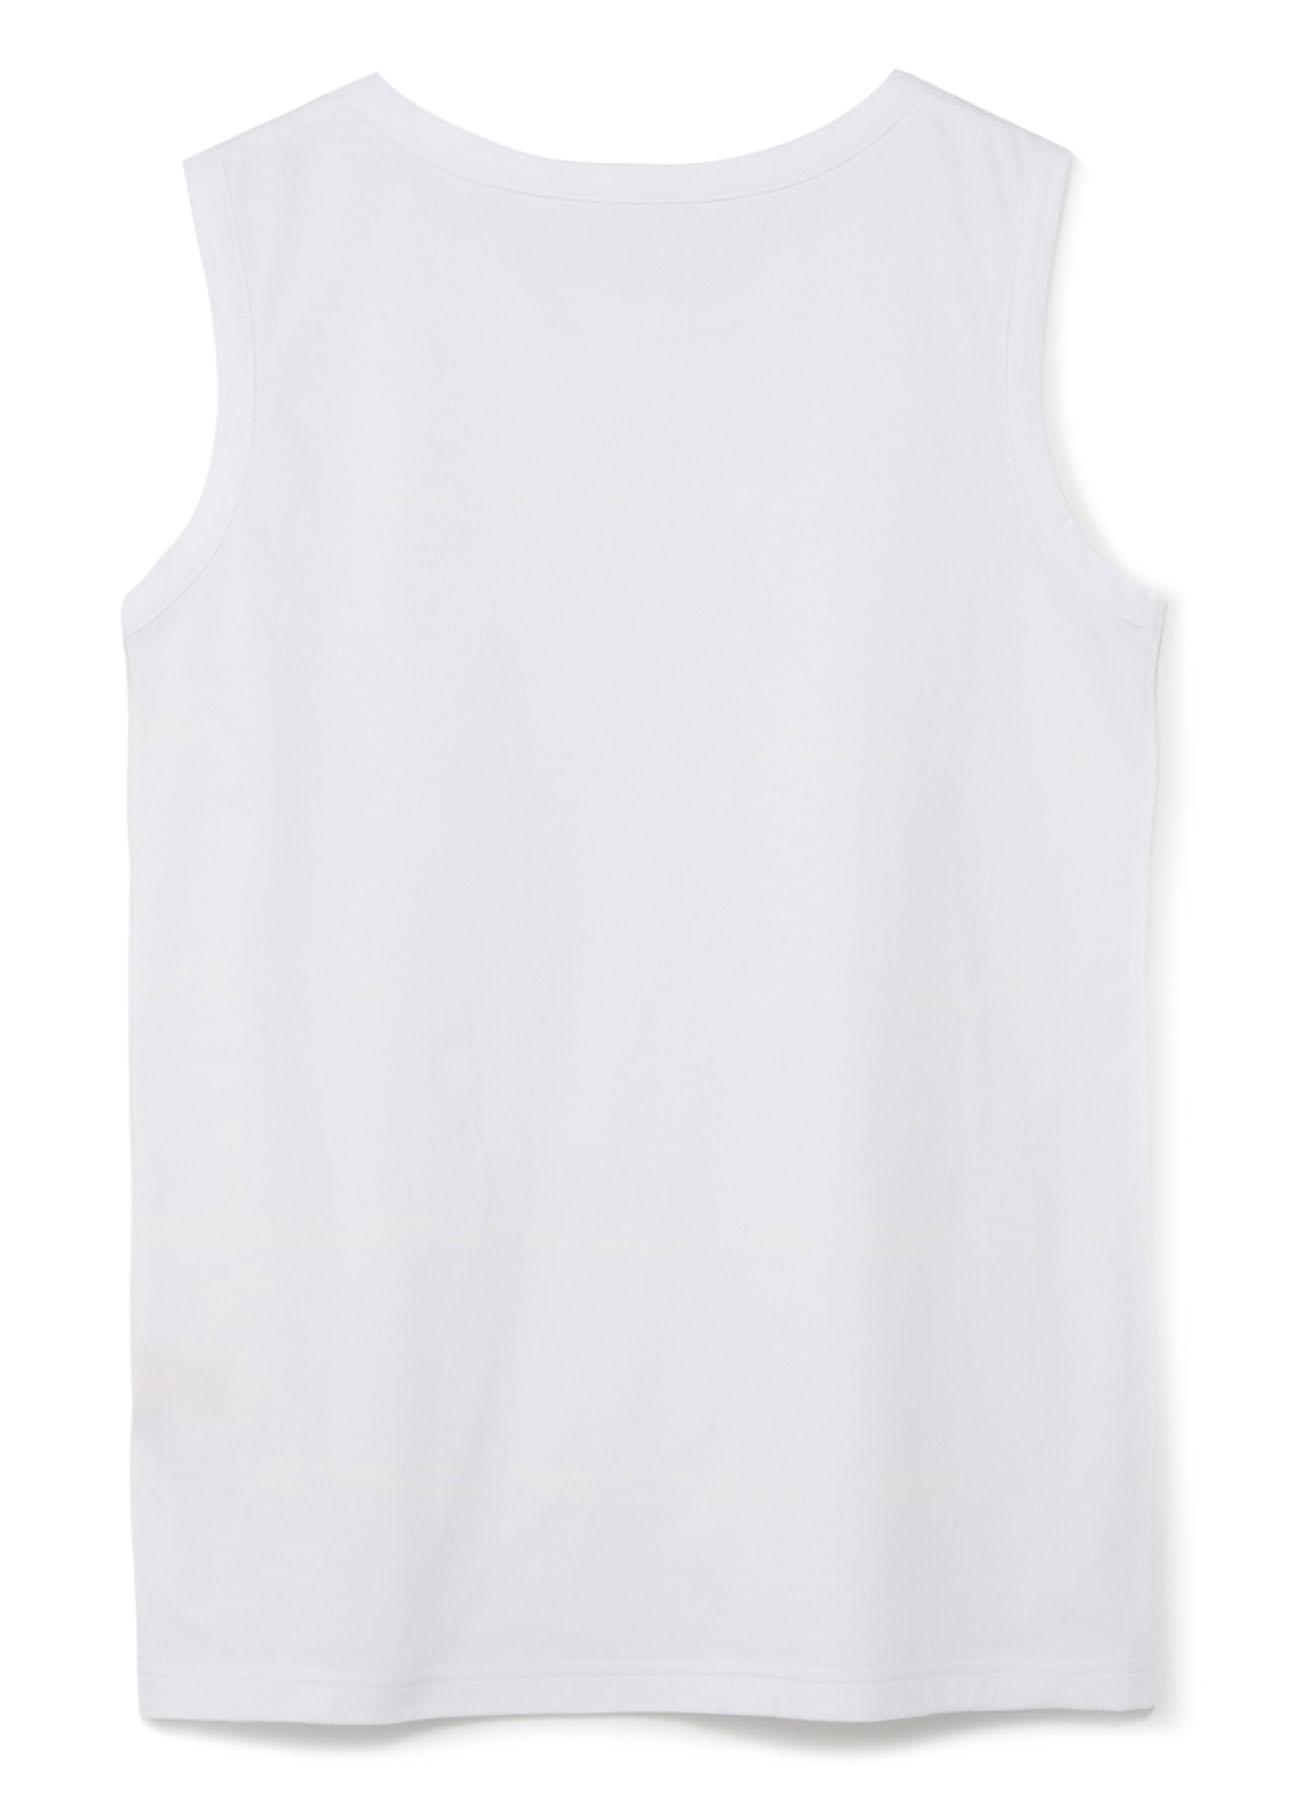 30/cotton Jersey Tank Top